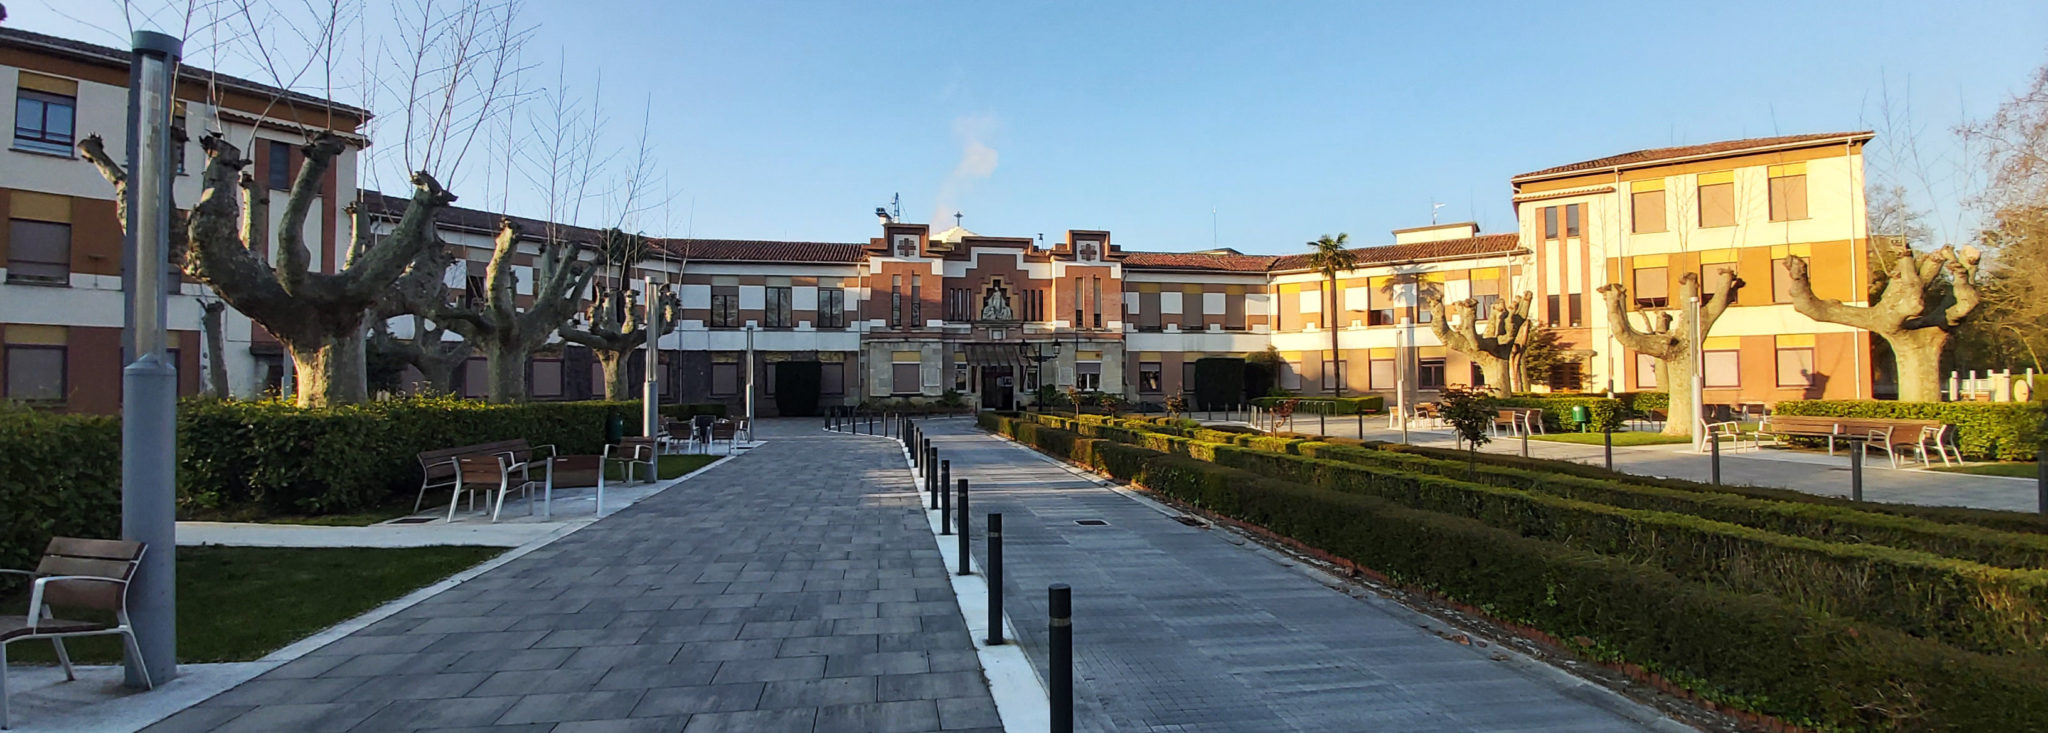 Fachada Casa de Misericordia Pamplona